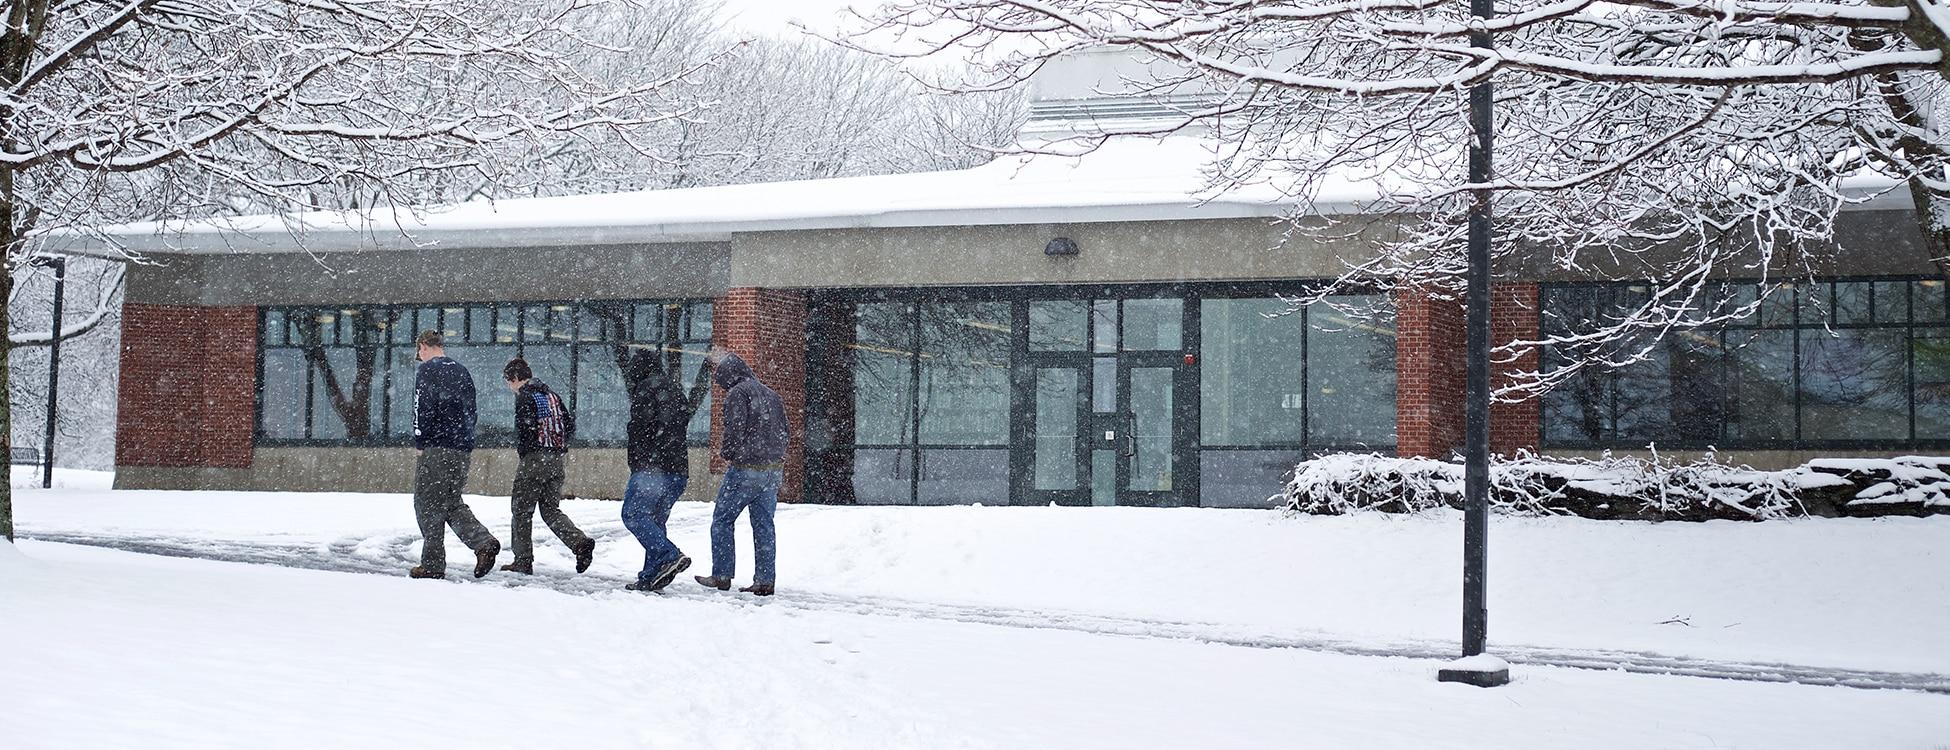 winter, snow, Hartness Library, students, walking, Randolph Center campus